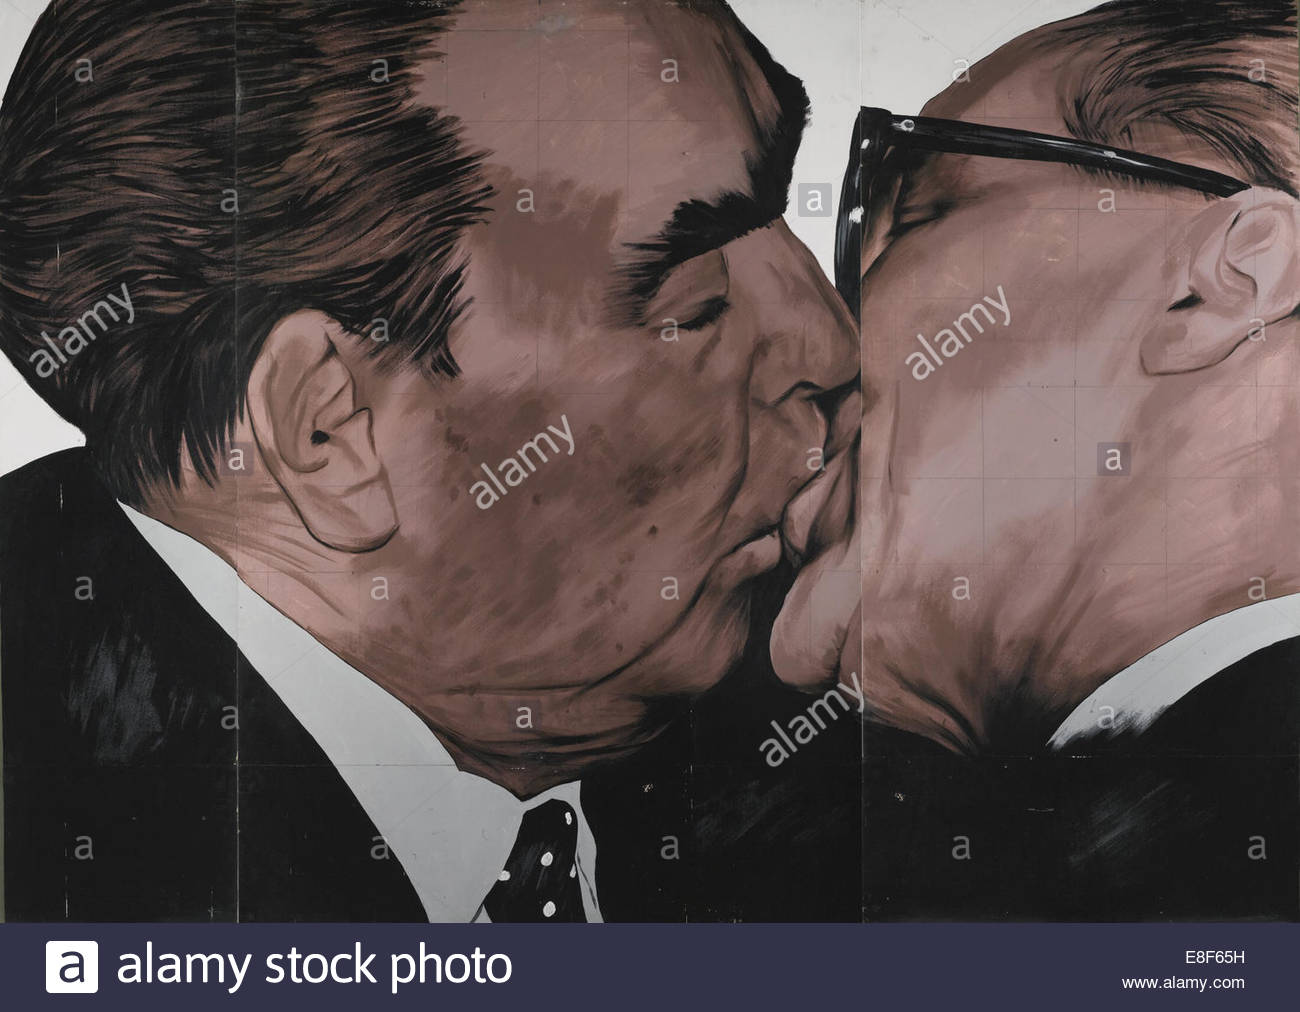 Fraternal Kiss. Artist: Vrubel, Dmitri Vladimirovich (*1960) - Stock Image